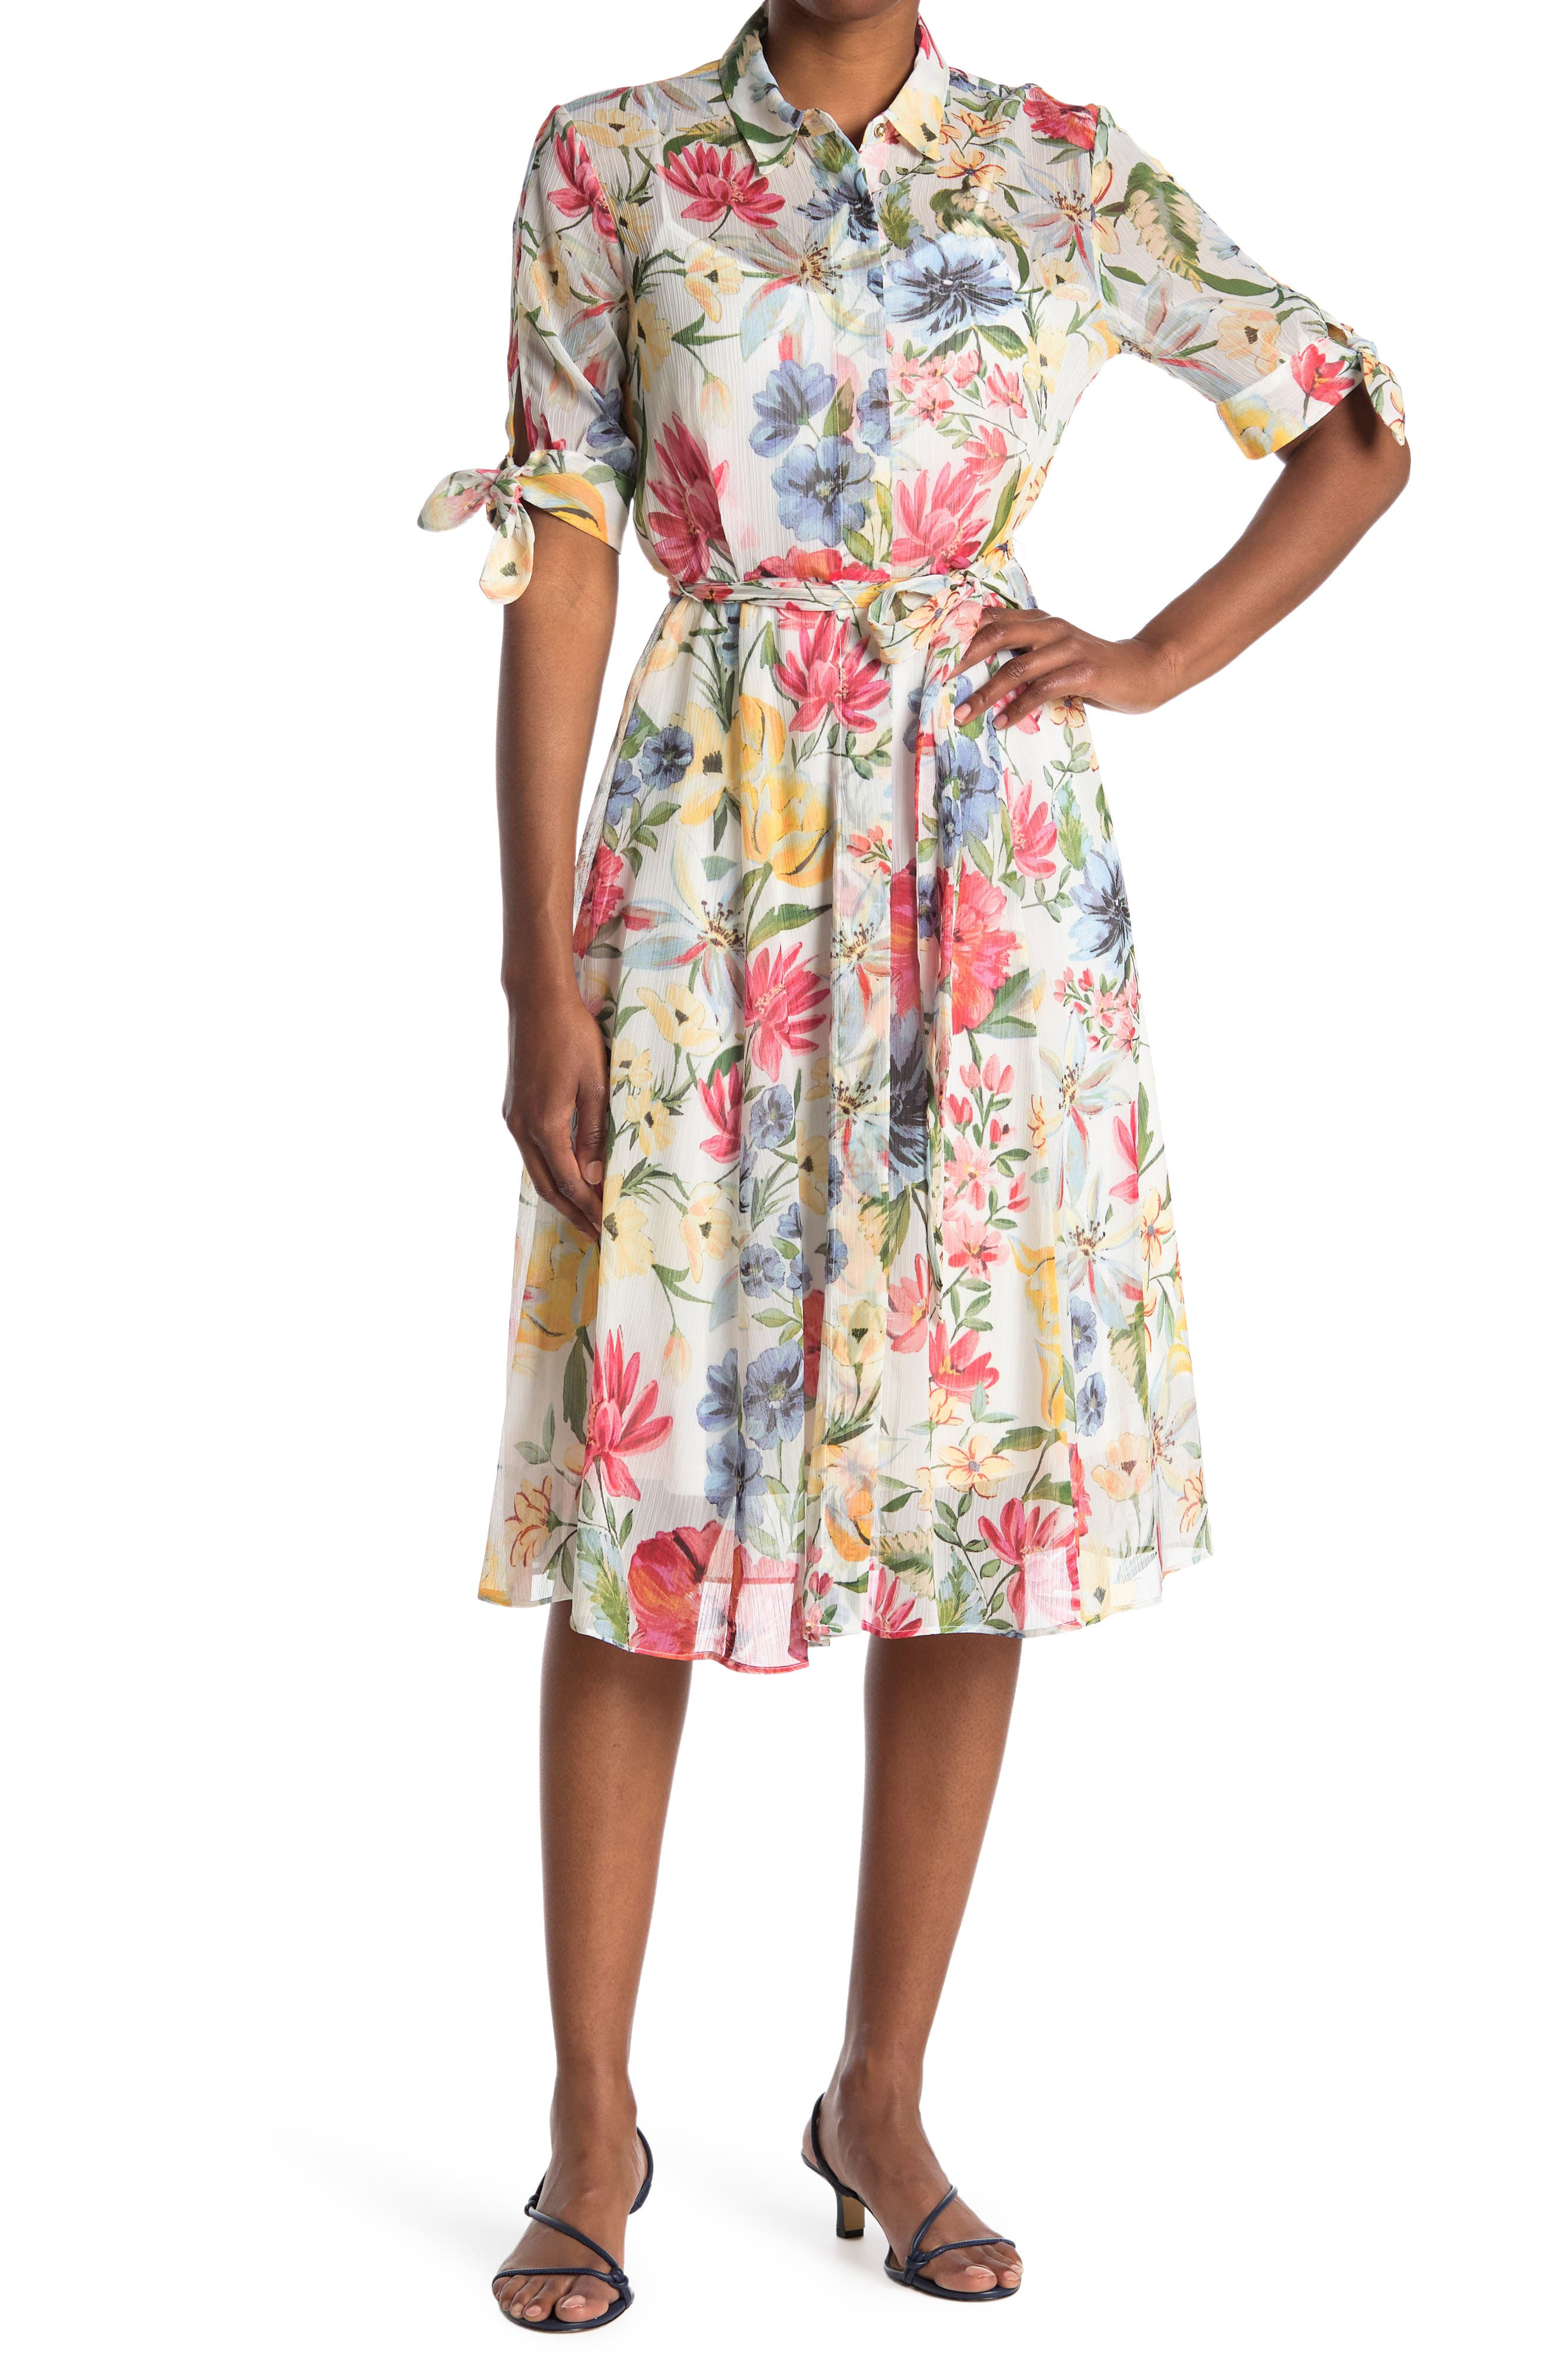 Image of Calvin Klein Floral Shirt Dress